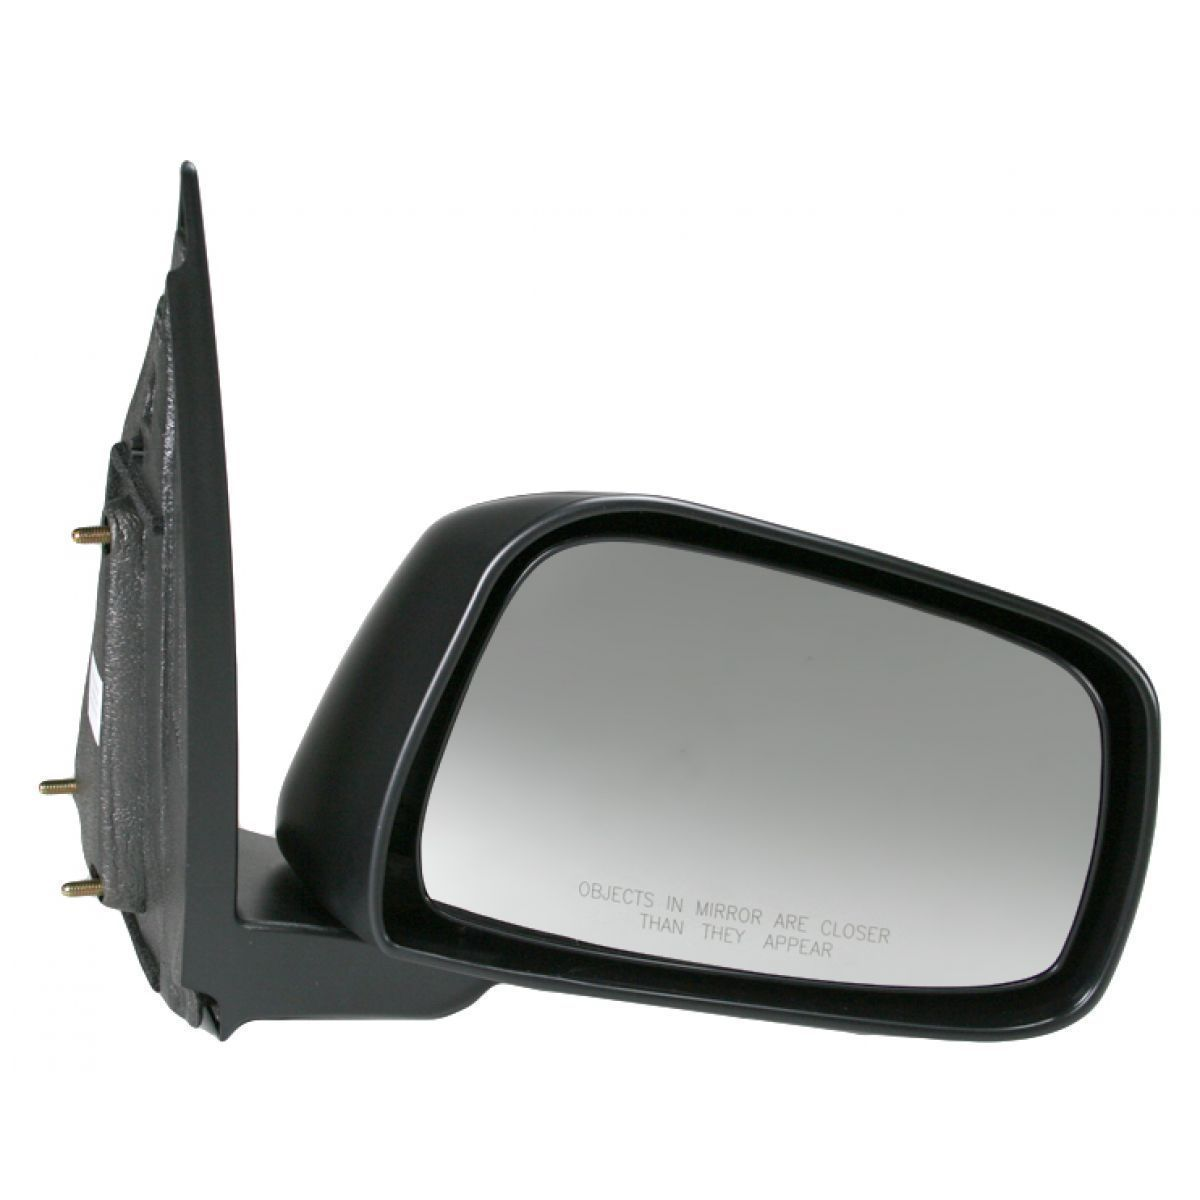 USミラー 新マニュアルサイドビュードアミラー乗客右RHとライフタイム保証付き New Manual Side View Door Mirror Passenger Right RH With Lifetime Warranty